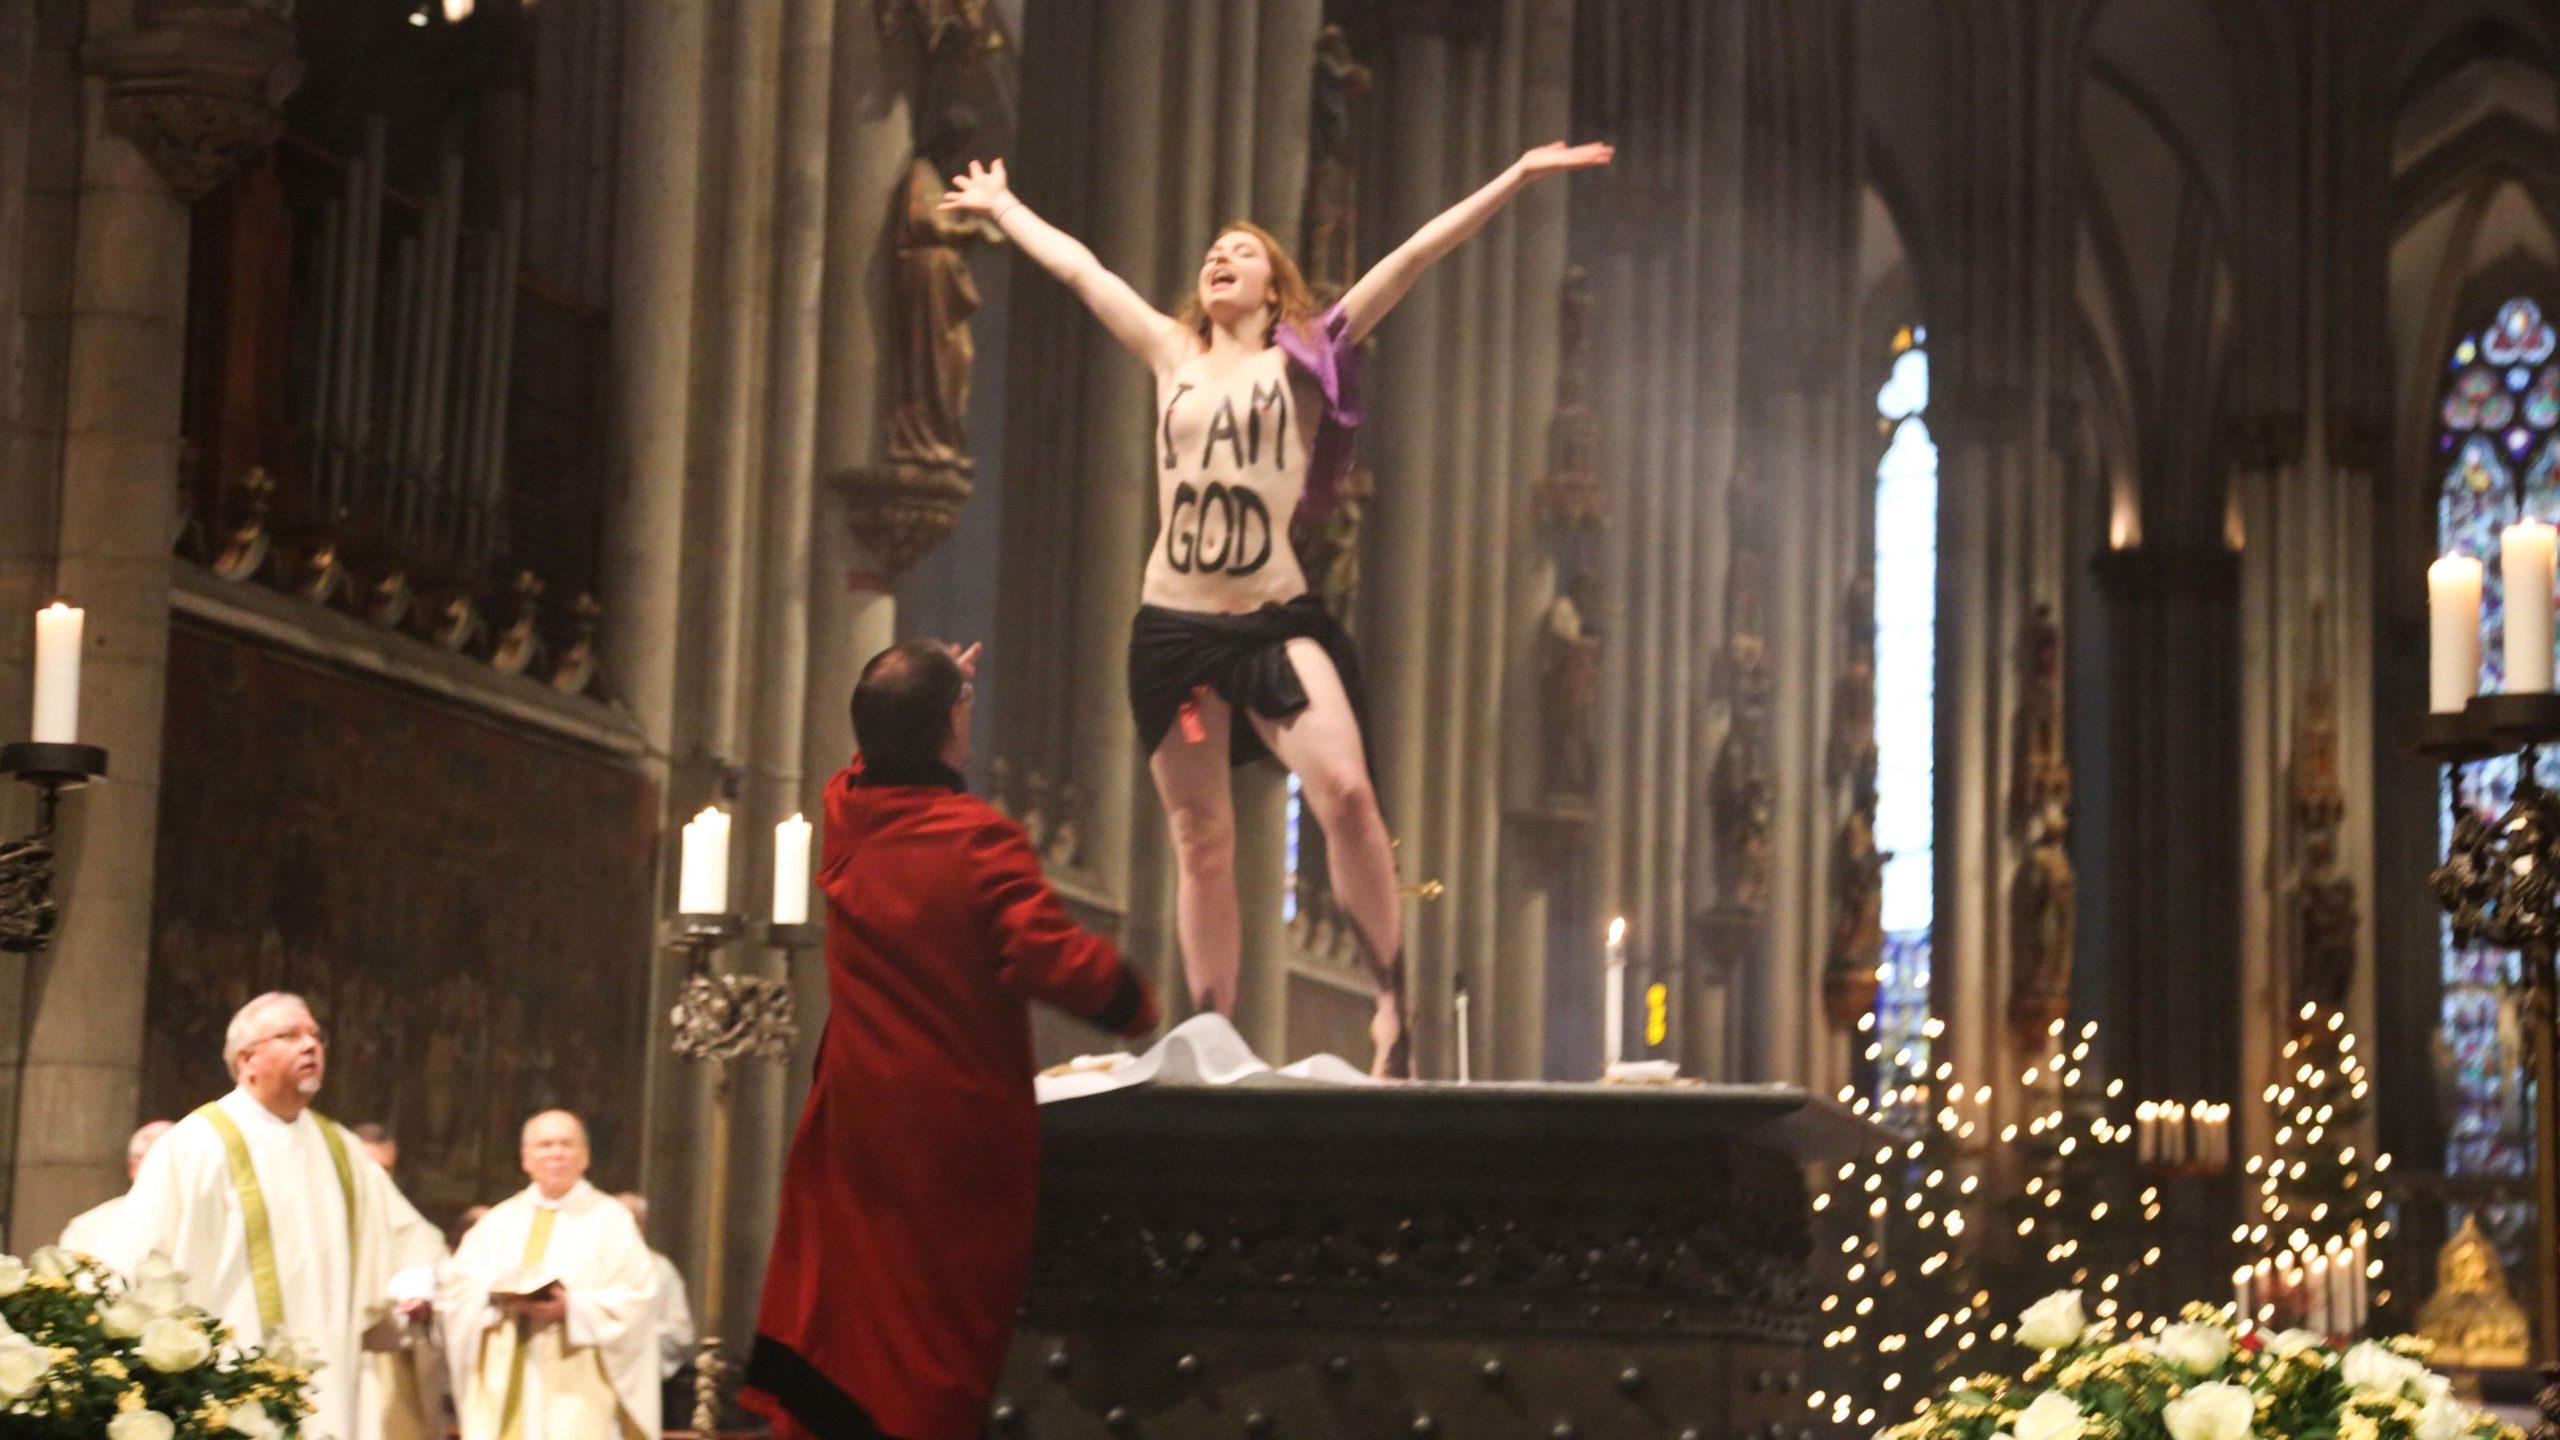 Femen-Protest im Kölner Dom: Nackte Frau klettert auf Altar